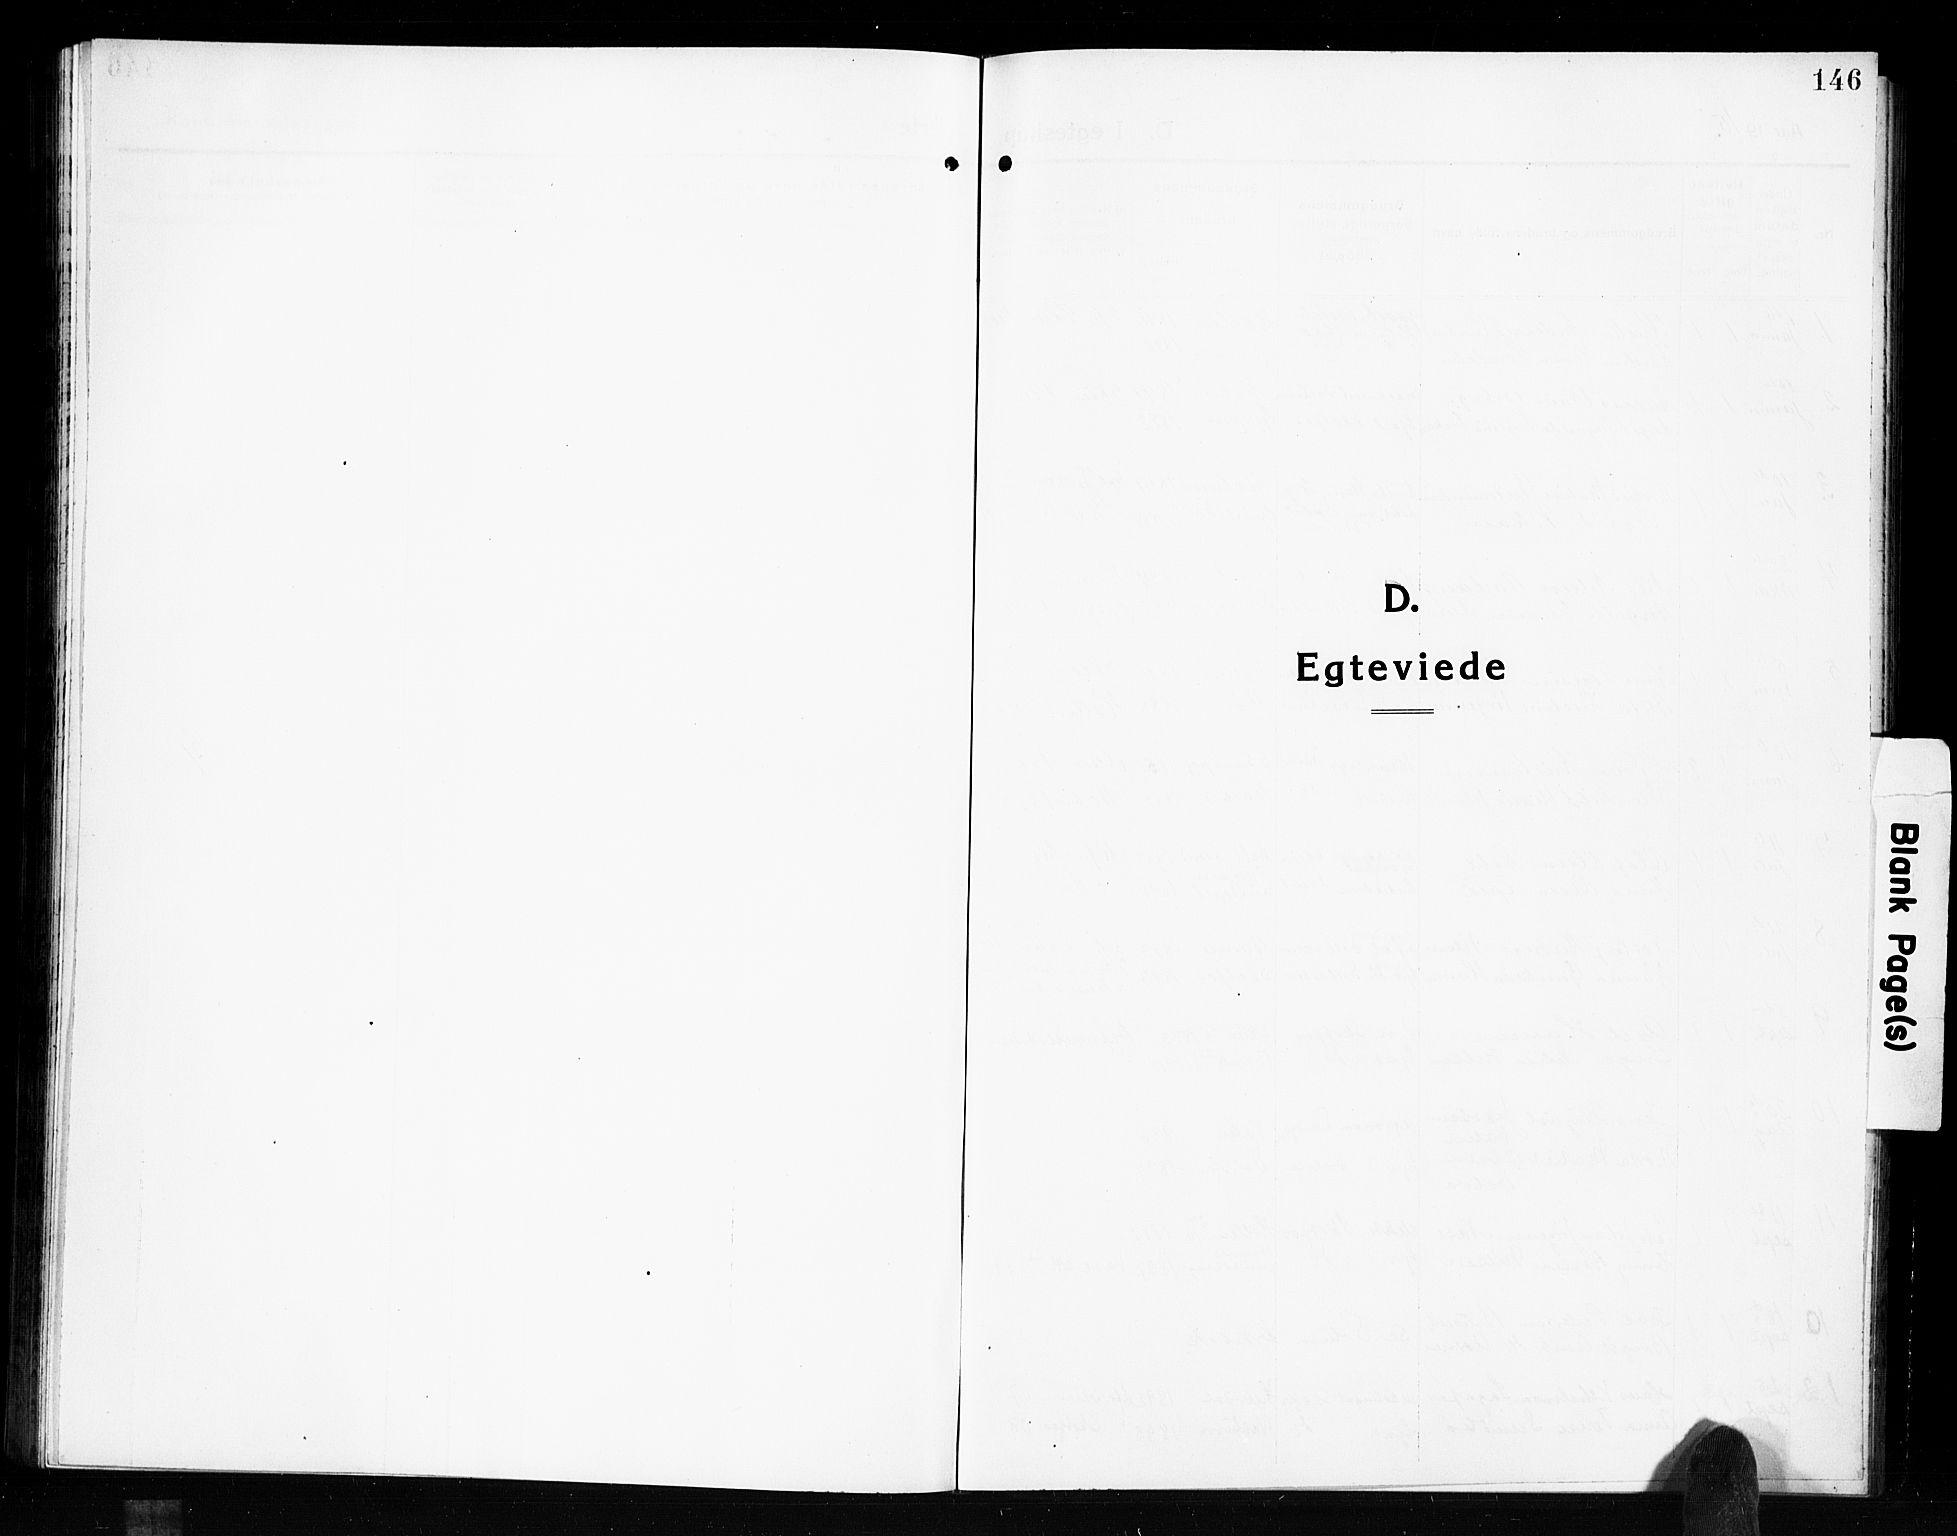 SAKO, Solum kirkebøker, G/Gb/L0006: Klokkerbok nr. II 6, 1915-1927, s. 146